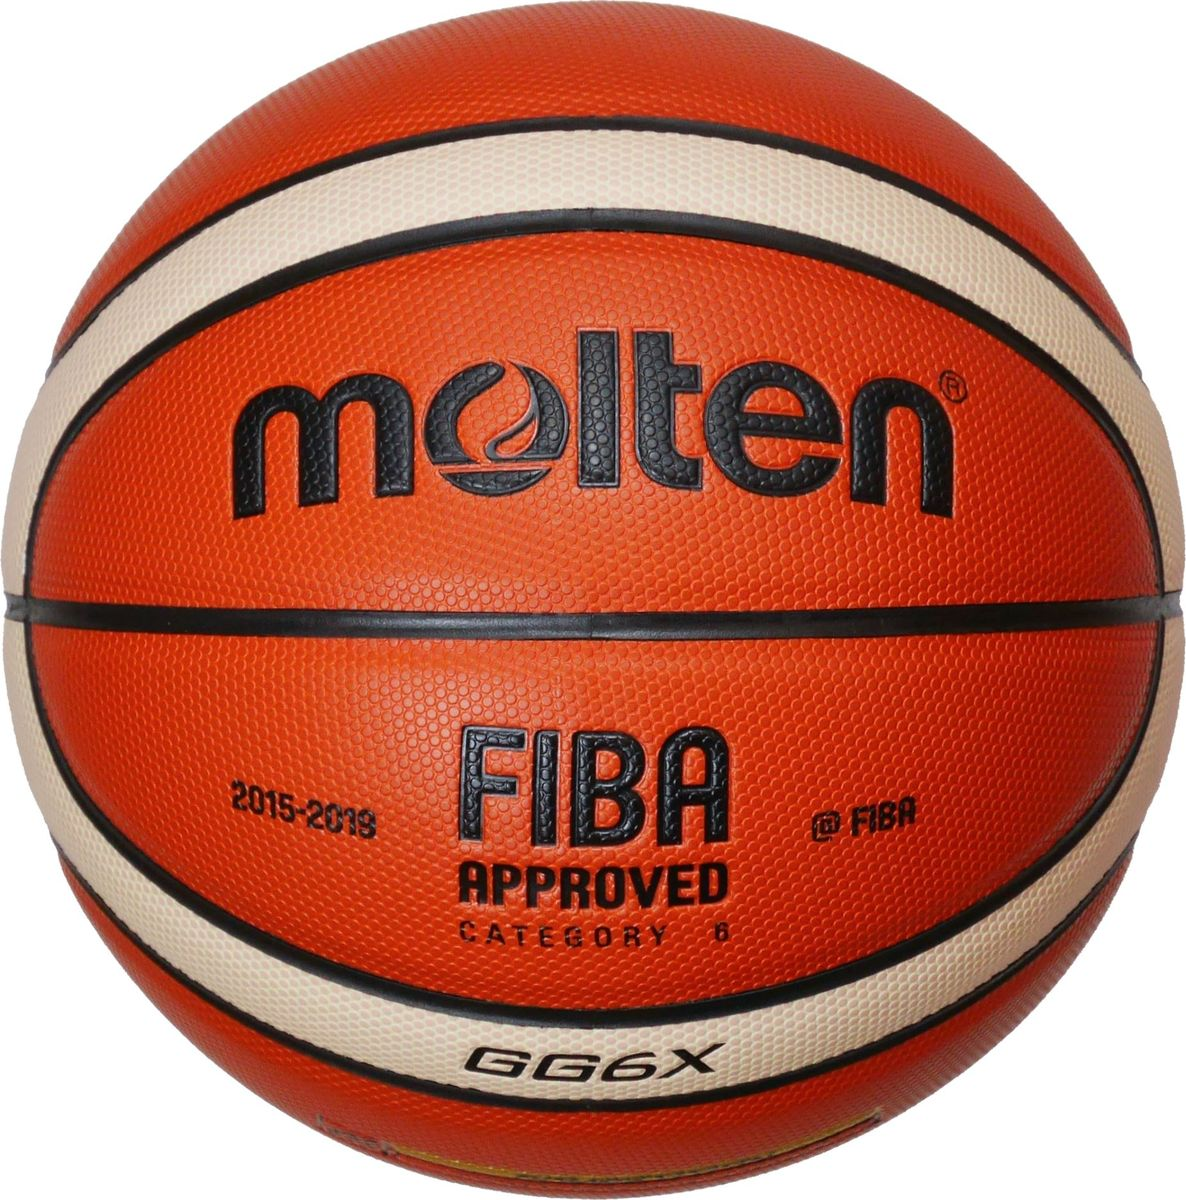 Мяч баскетбольный Molten. Размер 6. BGG6X баскетбольный мяч molten gm7 pu